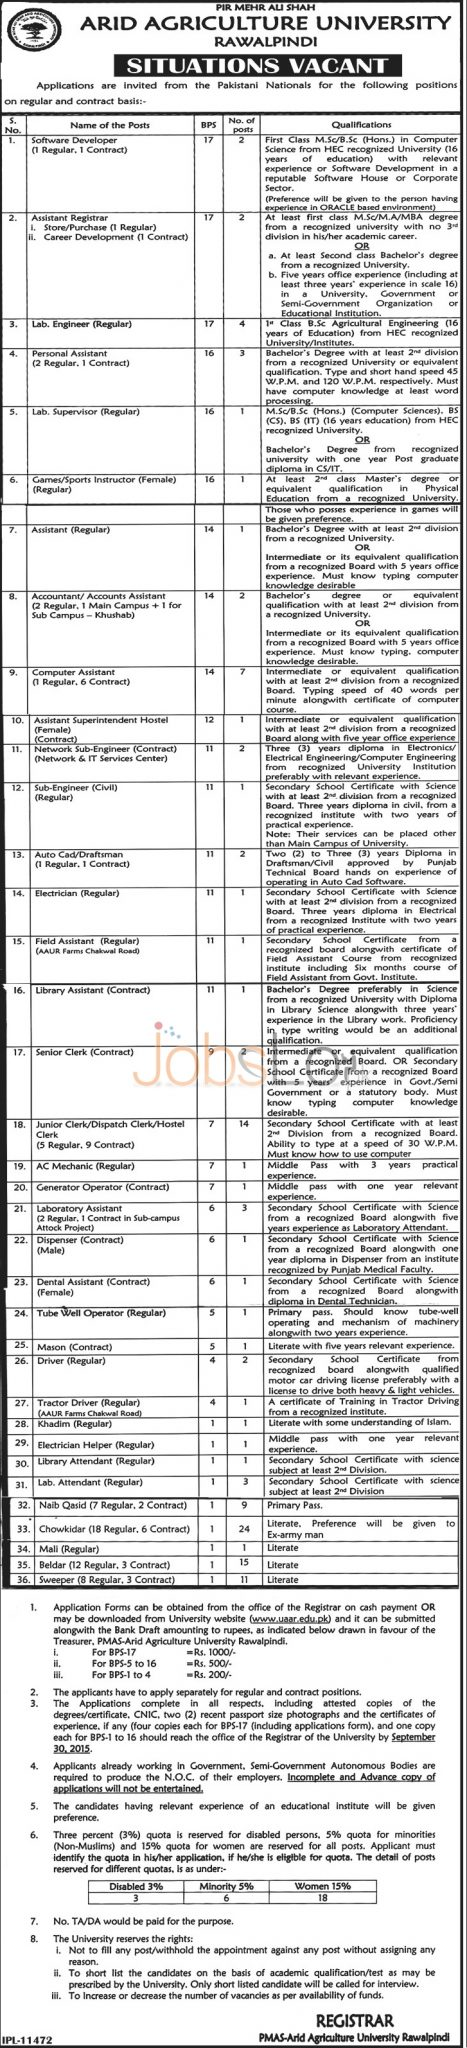 Arid Agriculture University Rawalpindi Job Opportunities 2015 Application Form